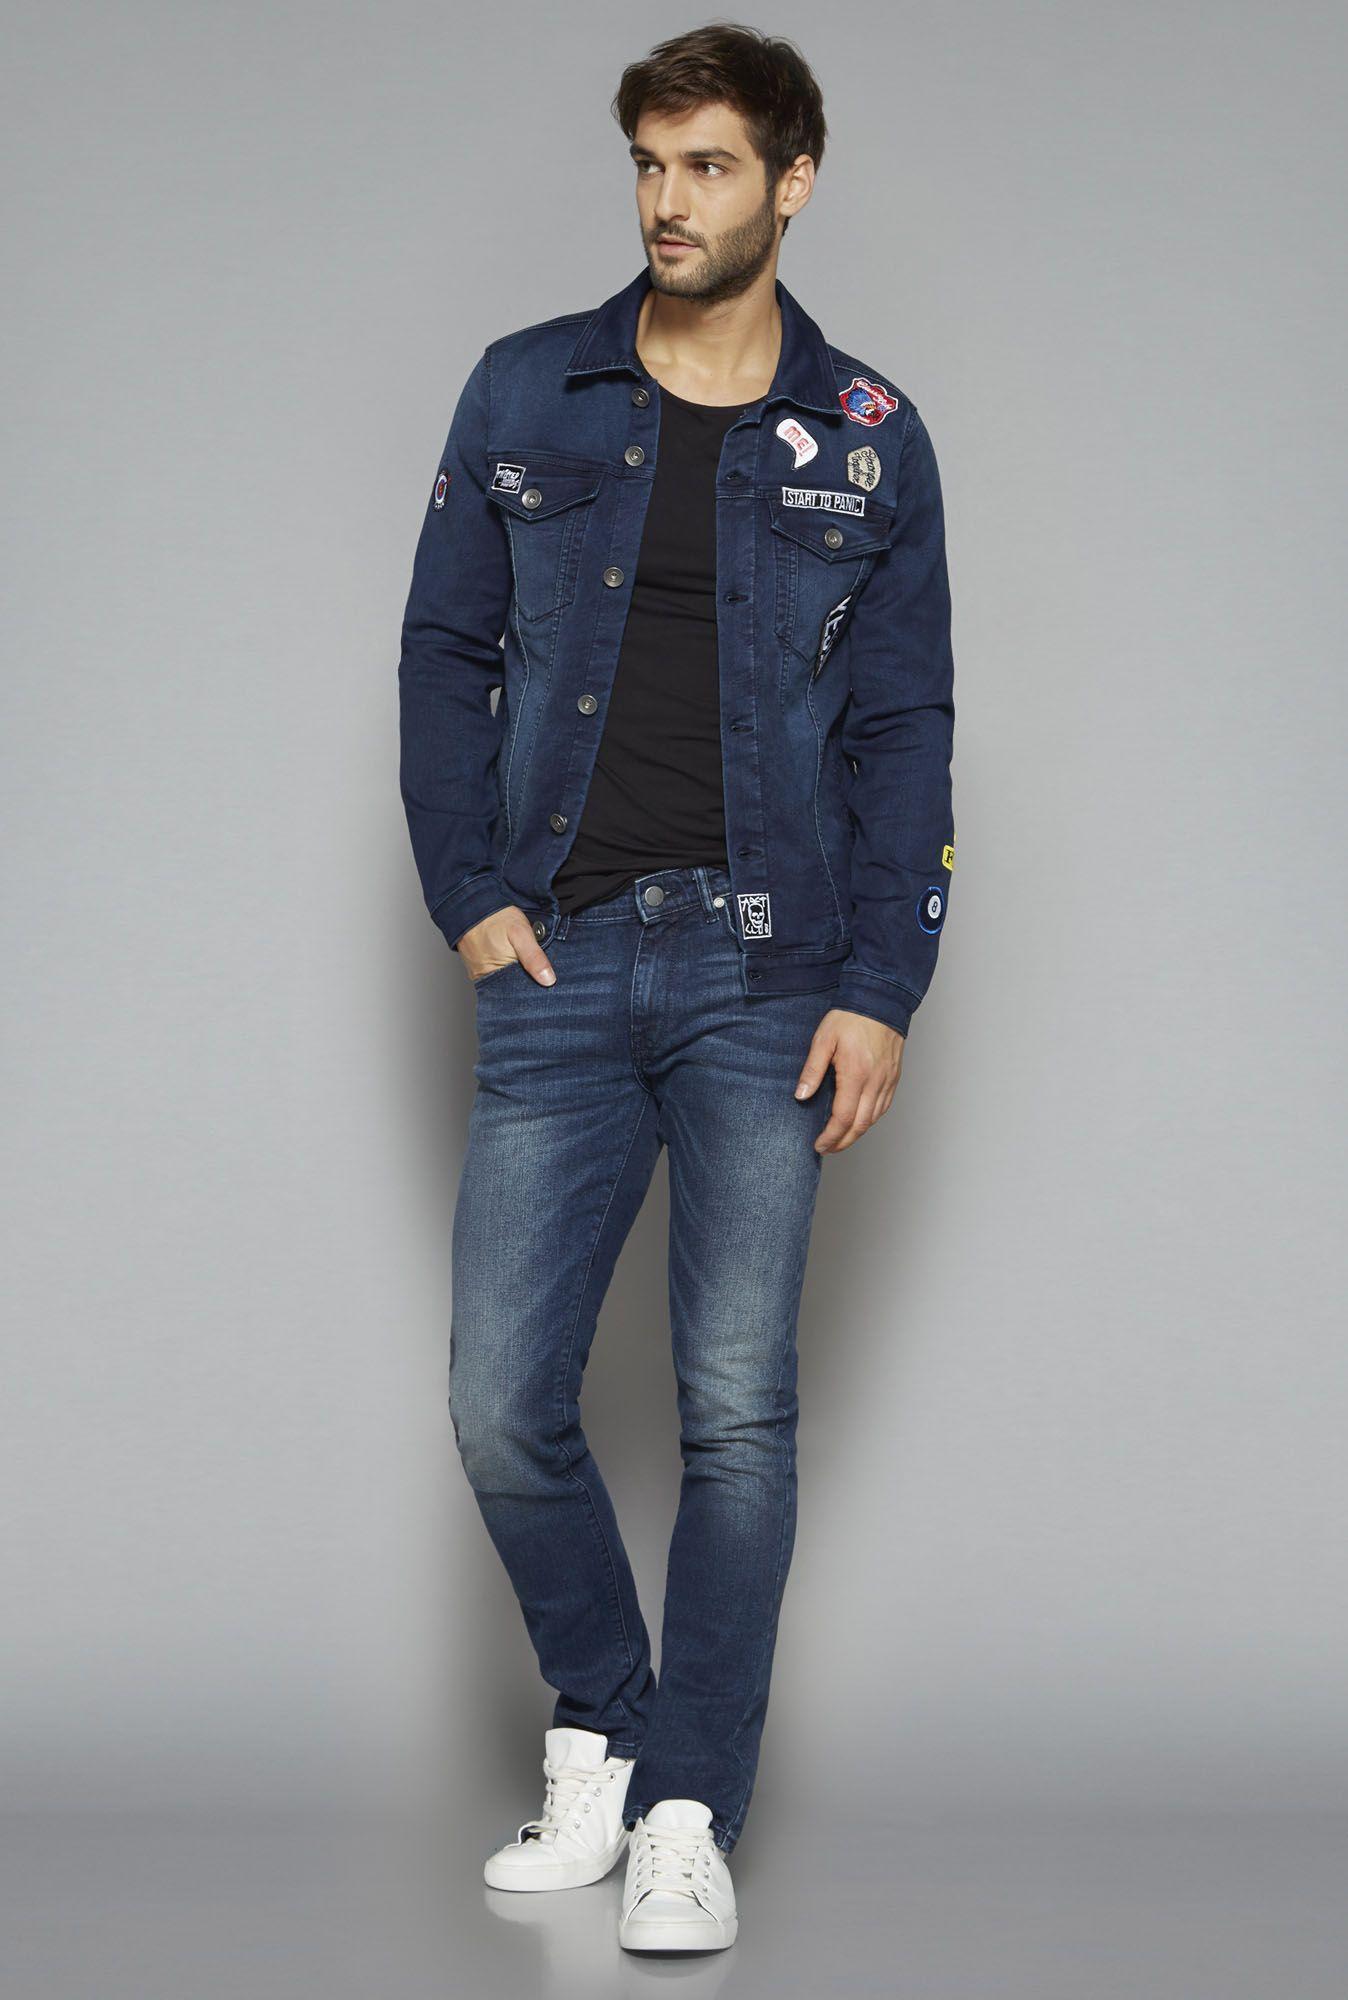 953617cb2 Nuon by Westside Blue Slim Fit Jacket Denim Button Up